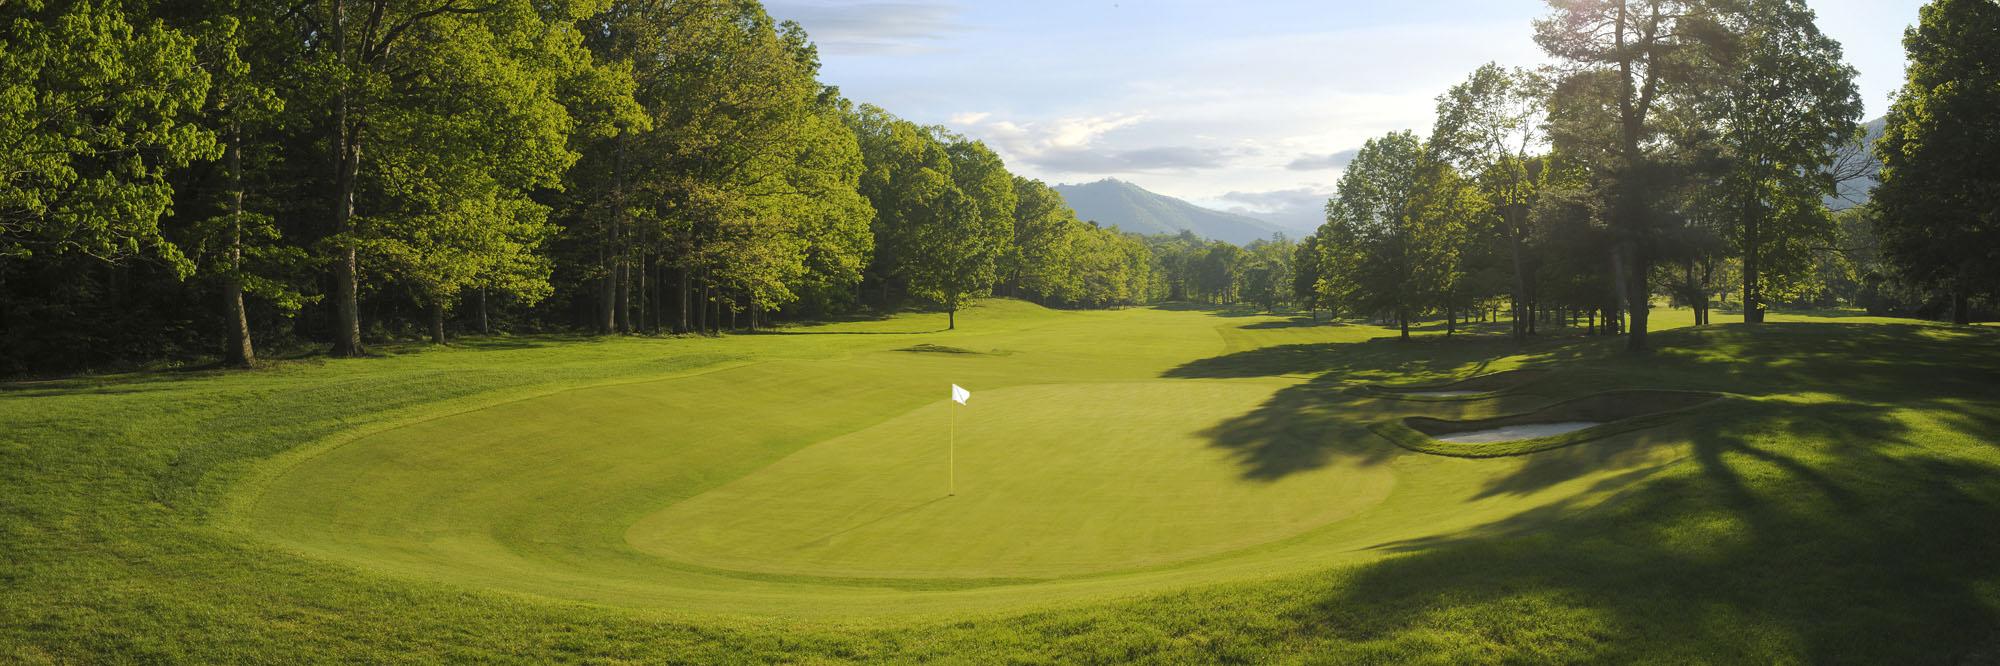 Golf Course Image - The Greenbrier Meadows Course No. 13